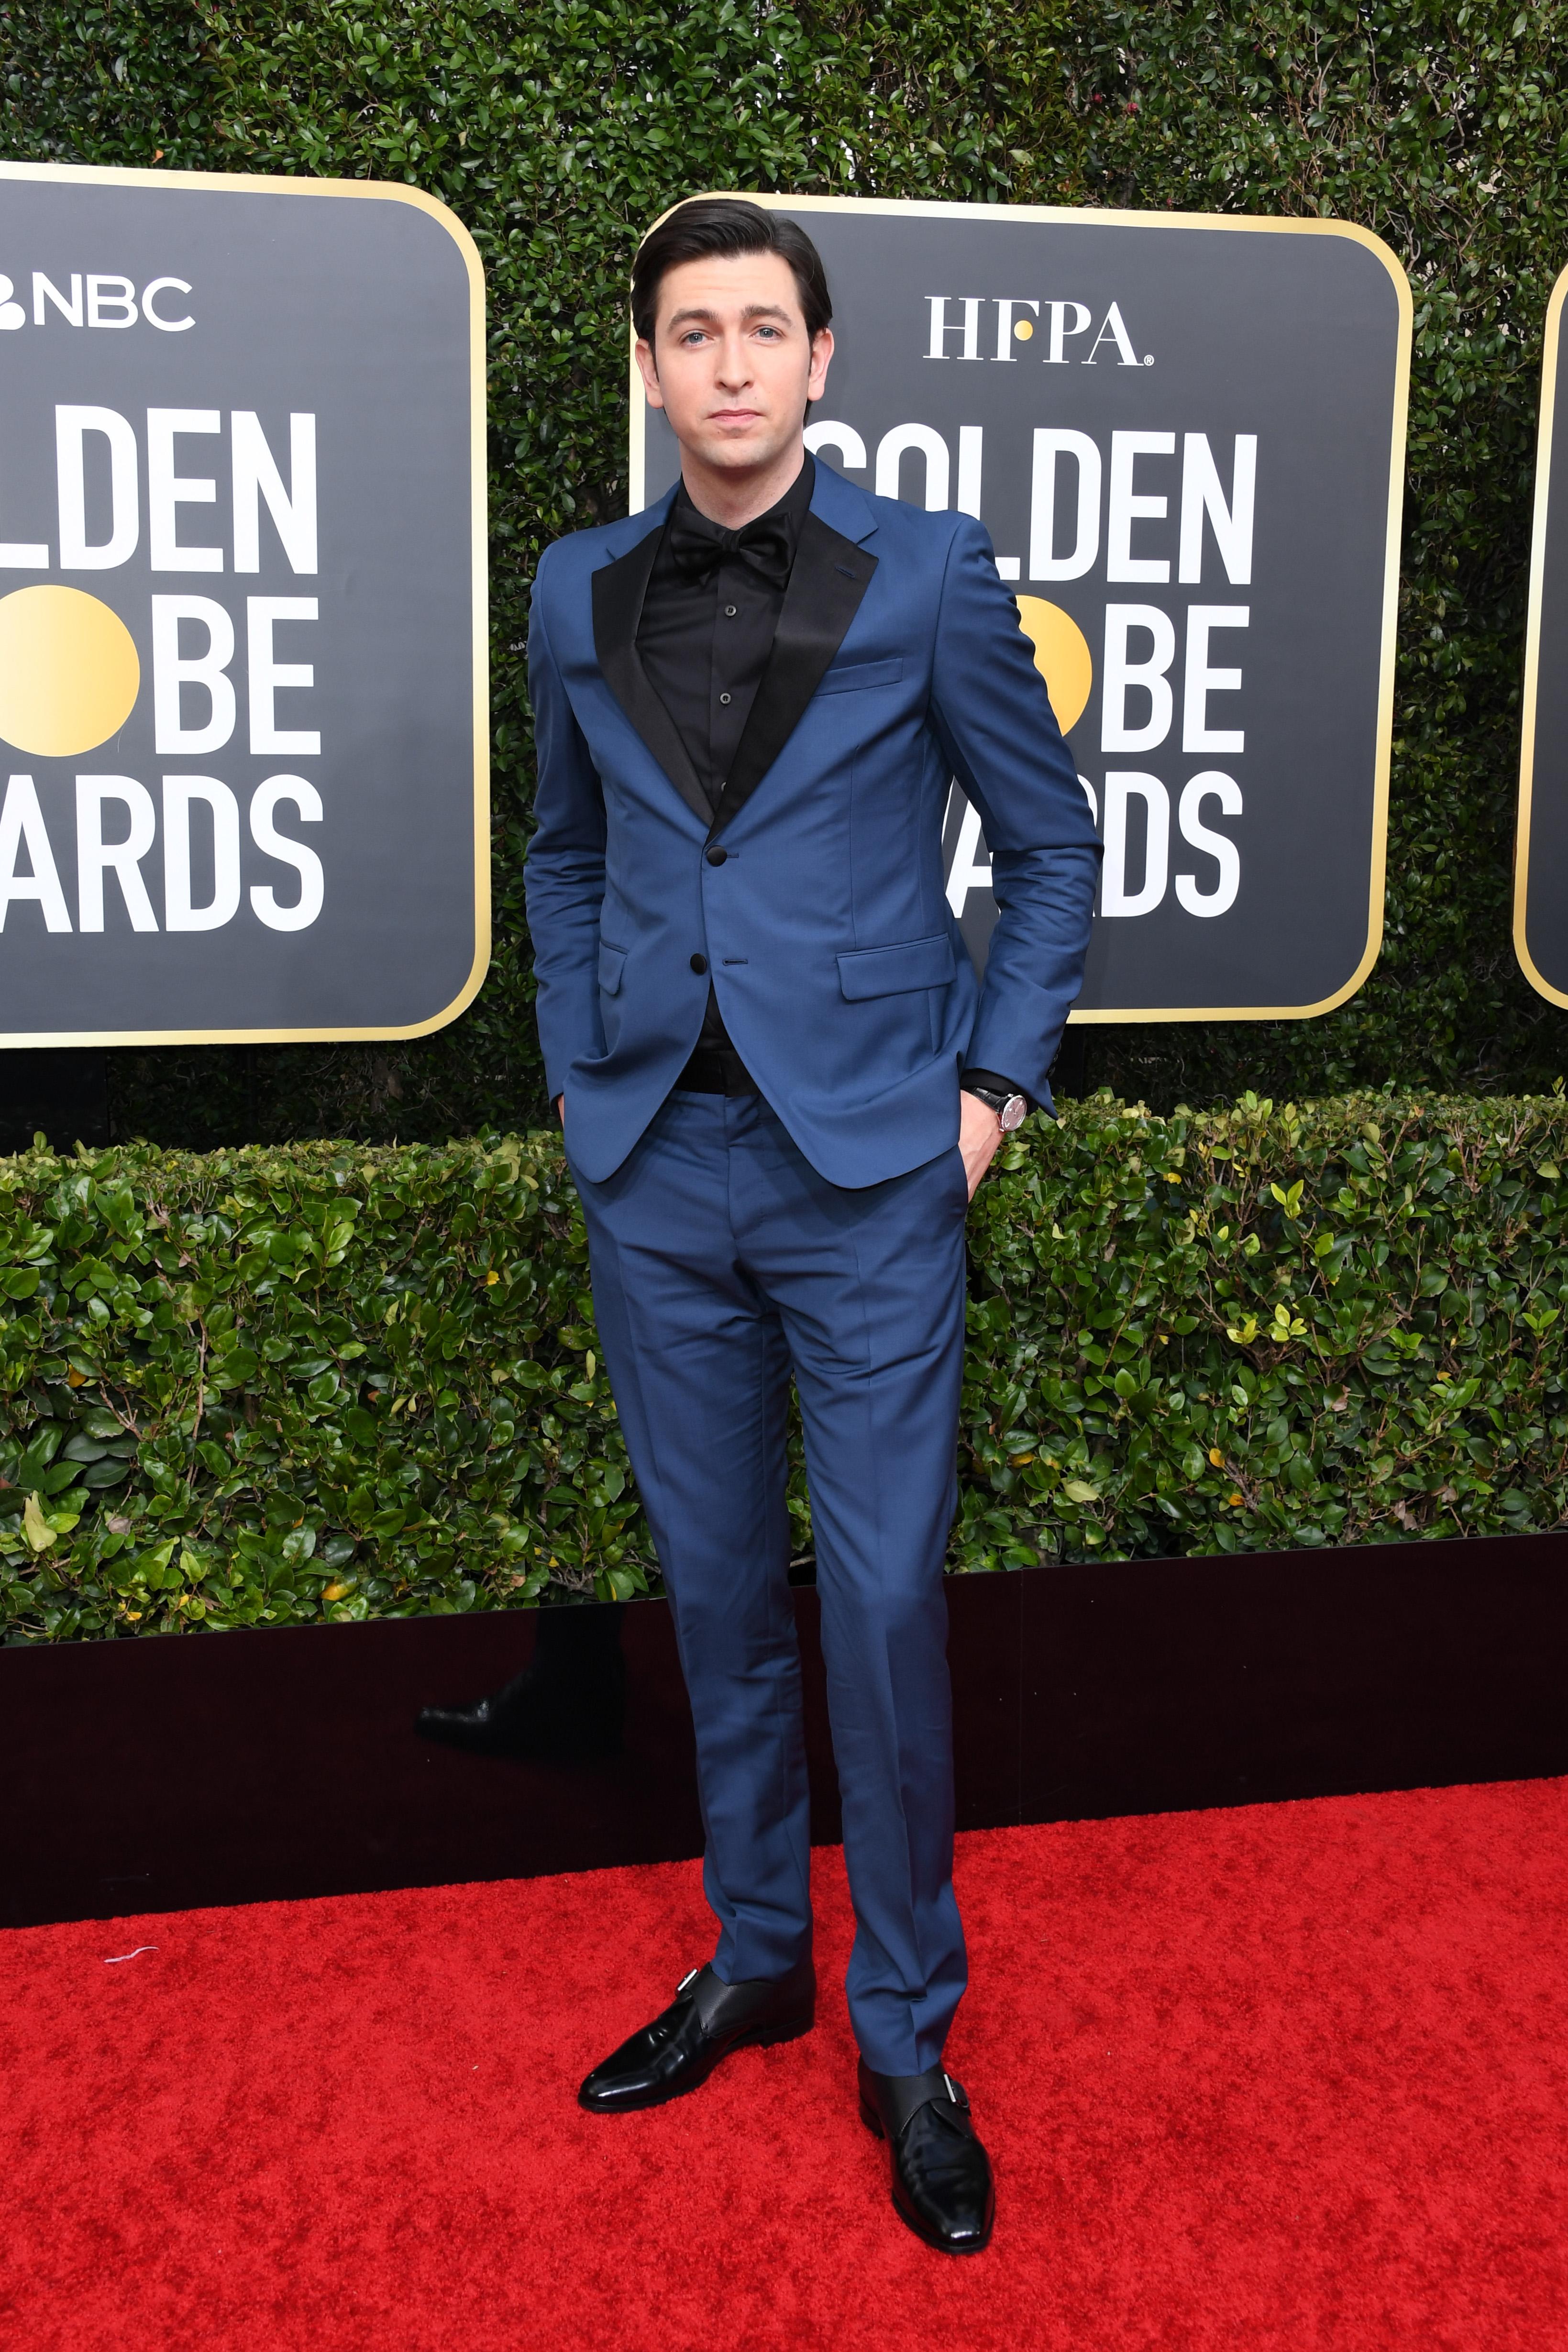 BEVERLY HILLS, CALIFORNIA - JANUARY 05: Nicholas Braun attends the 77th Annual Golden Globe Awards at The Beverly Hilton Hotel on January 05, 2020 in Beverly Hills, California. (Photo by Jon Kopaloff/Getty Images)